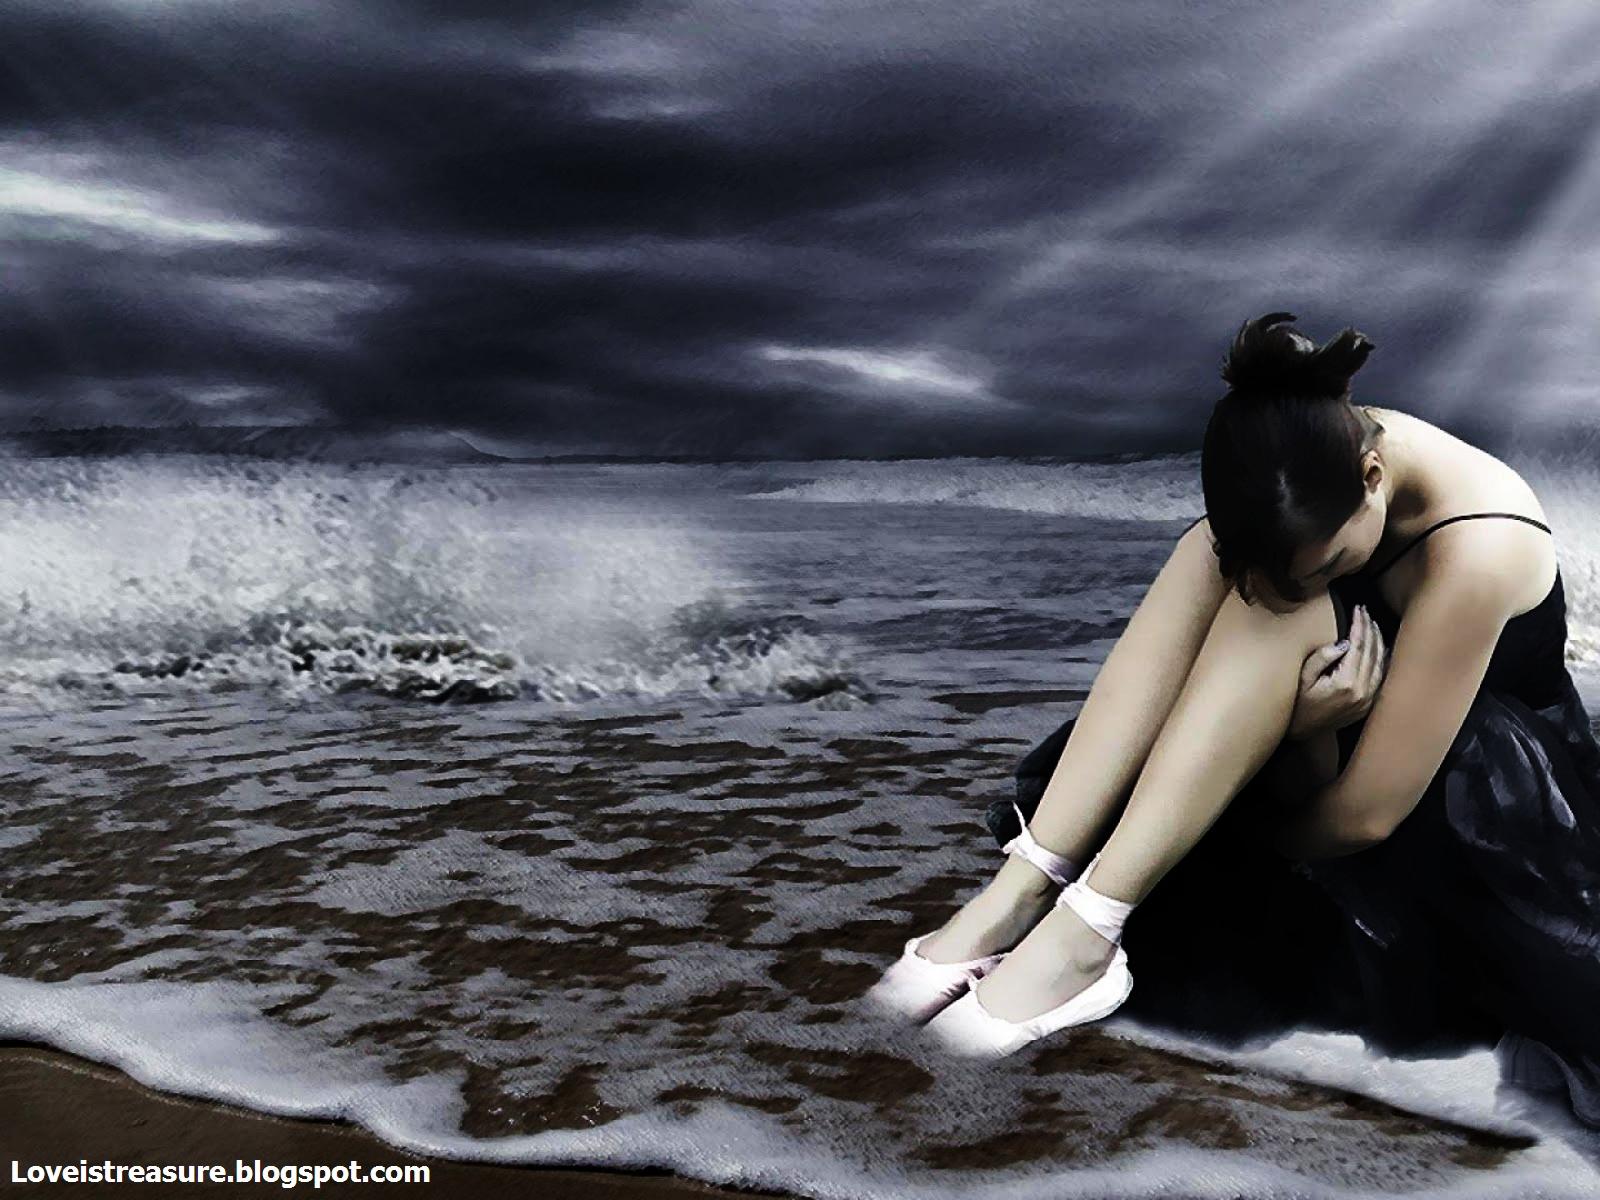 Alone sad girls Alone sad girls wallpapers Alone sad girl 1600x1200